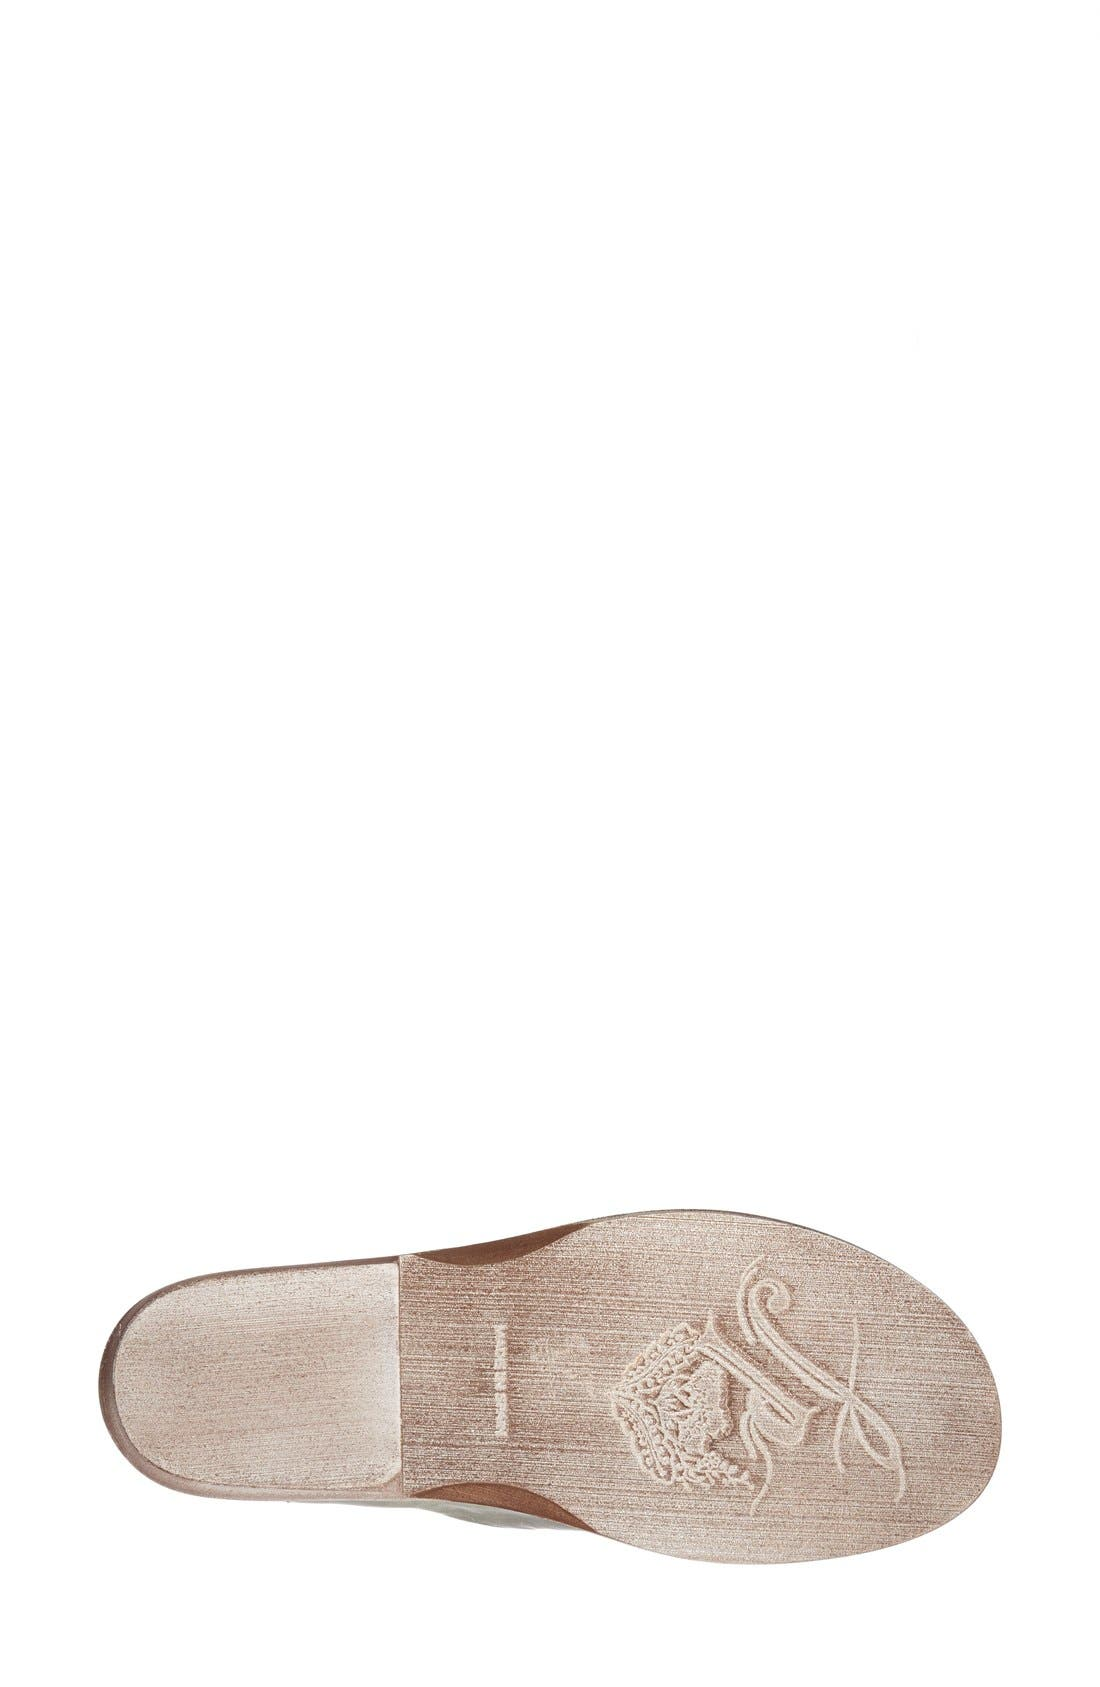 'Mont Blanc' Asymmetrical Sandal,                             Alternate thumbnail 47, color,